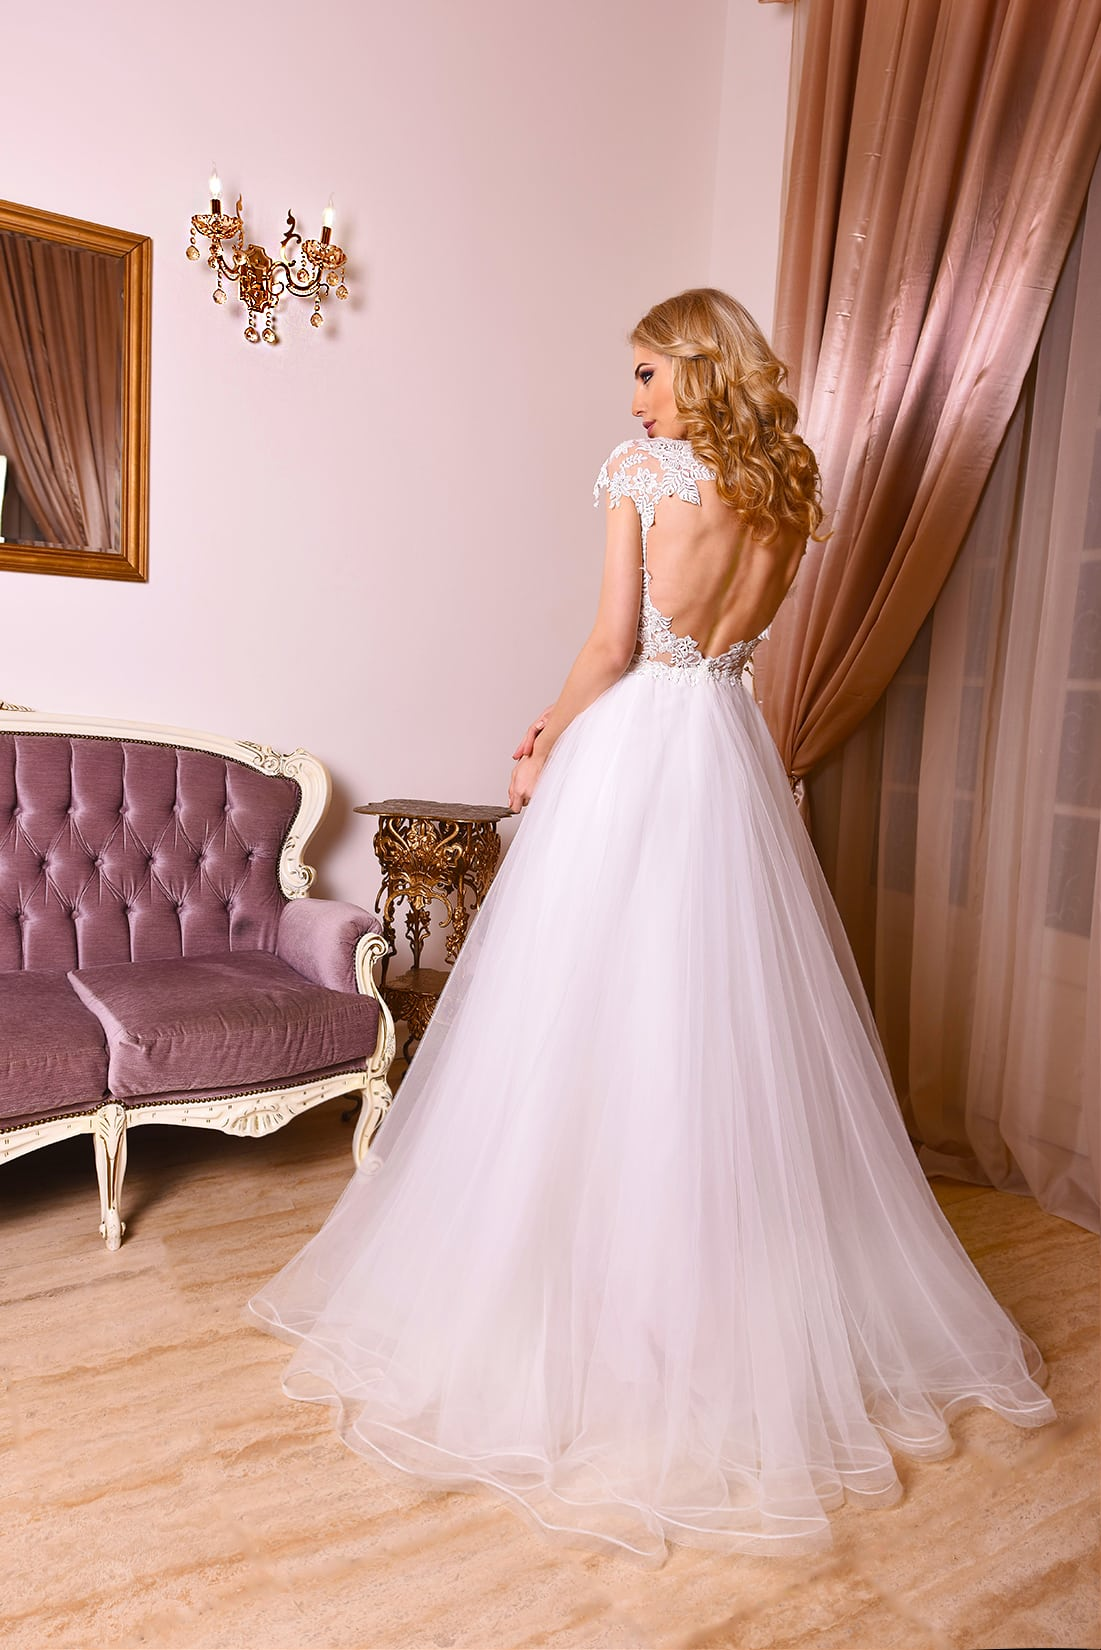 Nicola Model - Colectia Baroque - Adora Sposa (2)